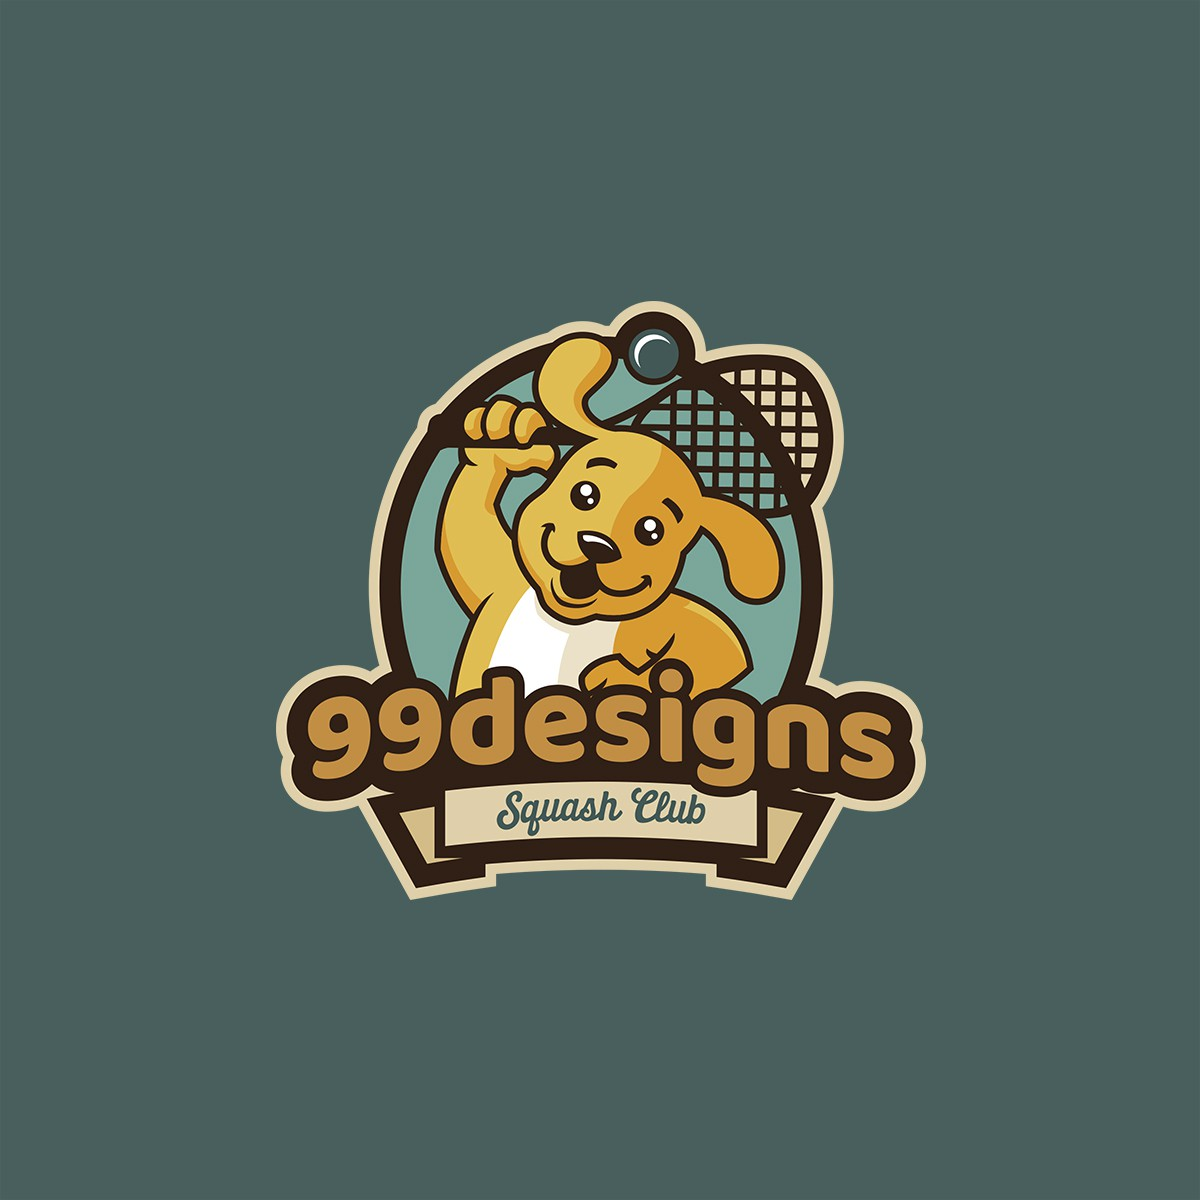 Custom logo design for sports/squash team